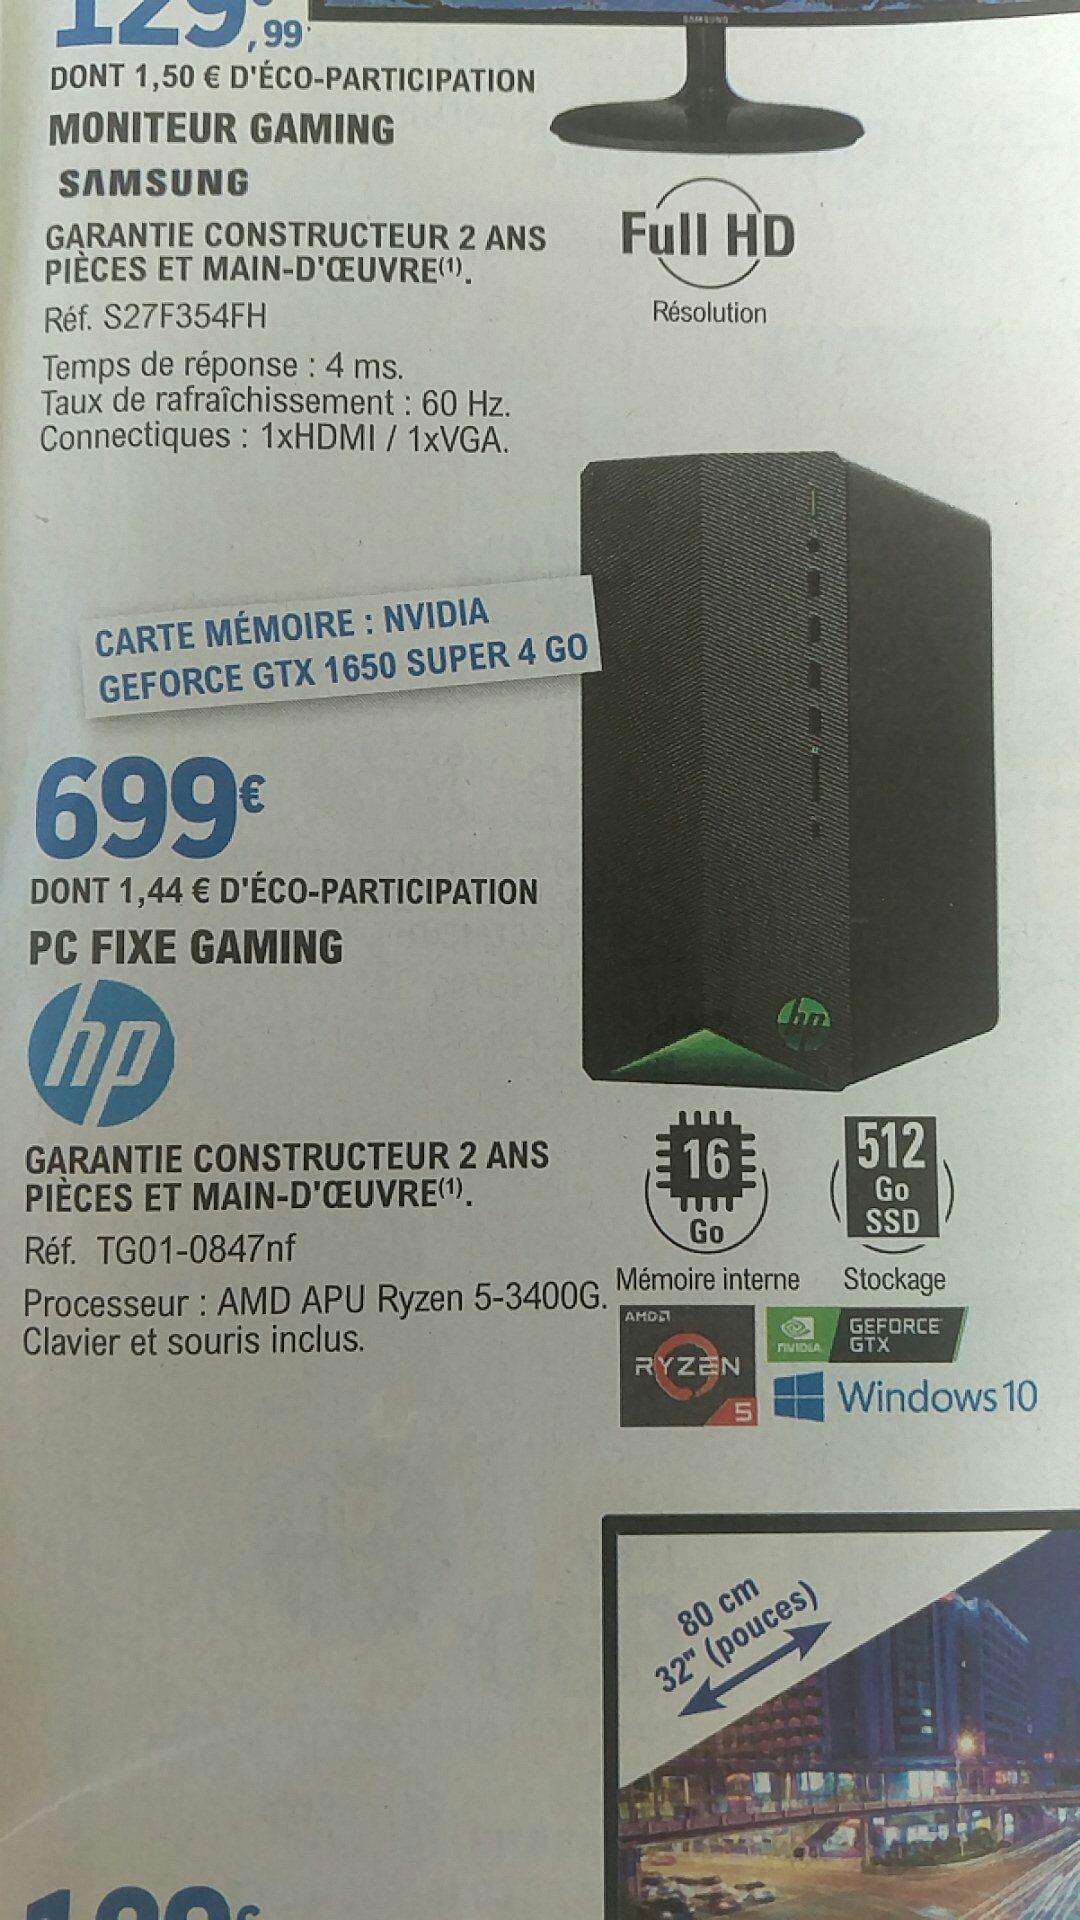 PC fixe gaming HP TG01-0847nf - Ryzen 5-3400G, 16Go de Ram, SSD 512Go - Gouesnou (29)